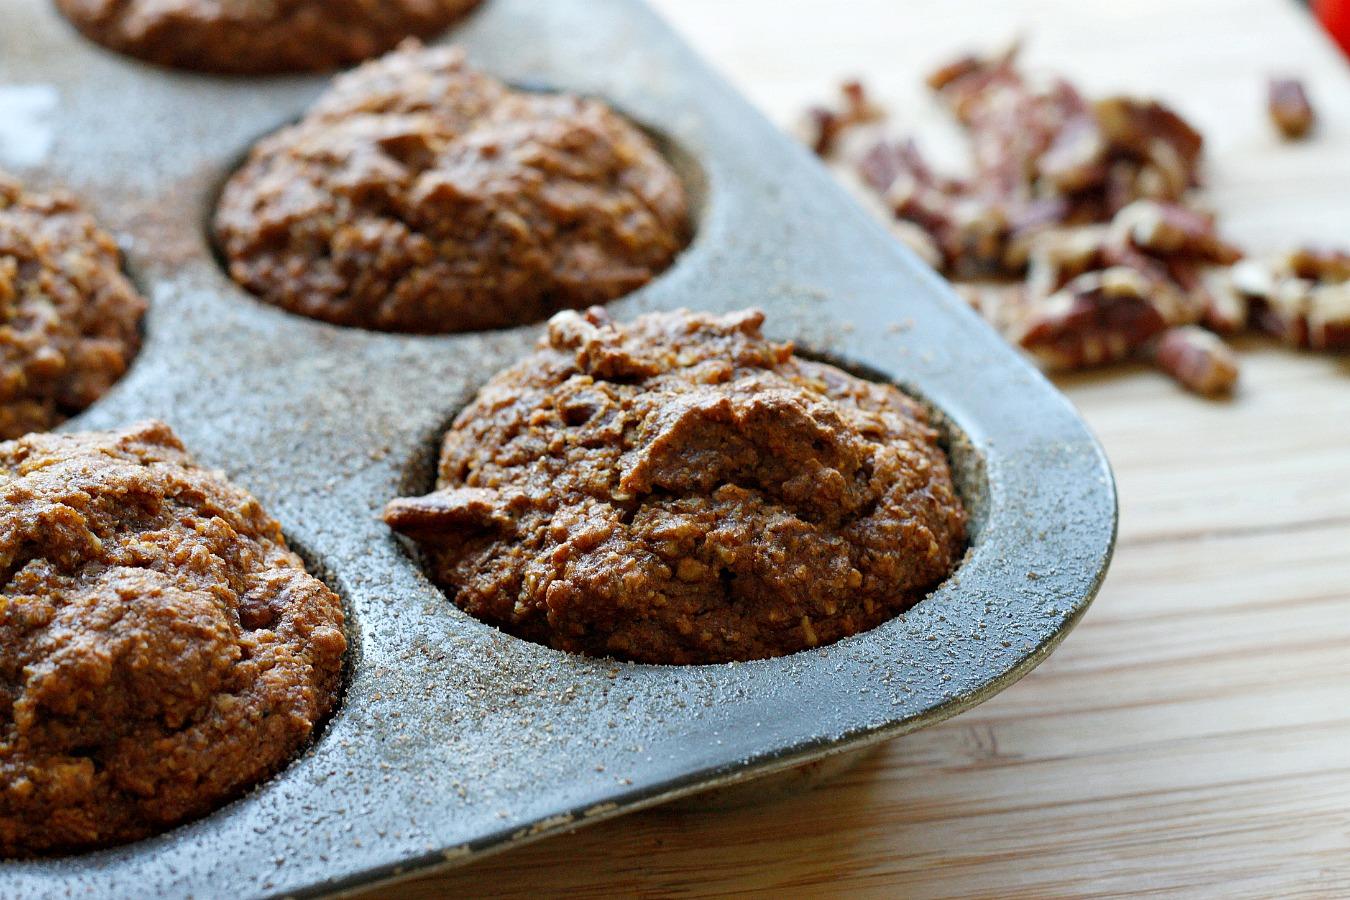 Whole Wheat Flax Bran Pumpkin Muffins | Fabtastic Eats